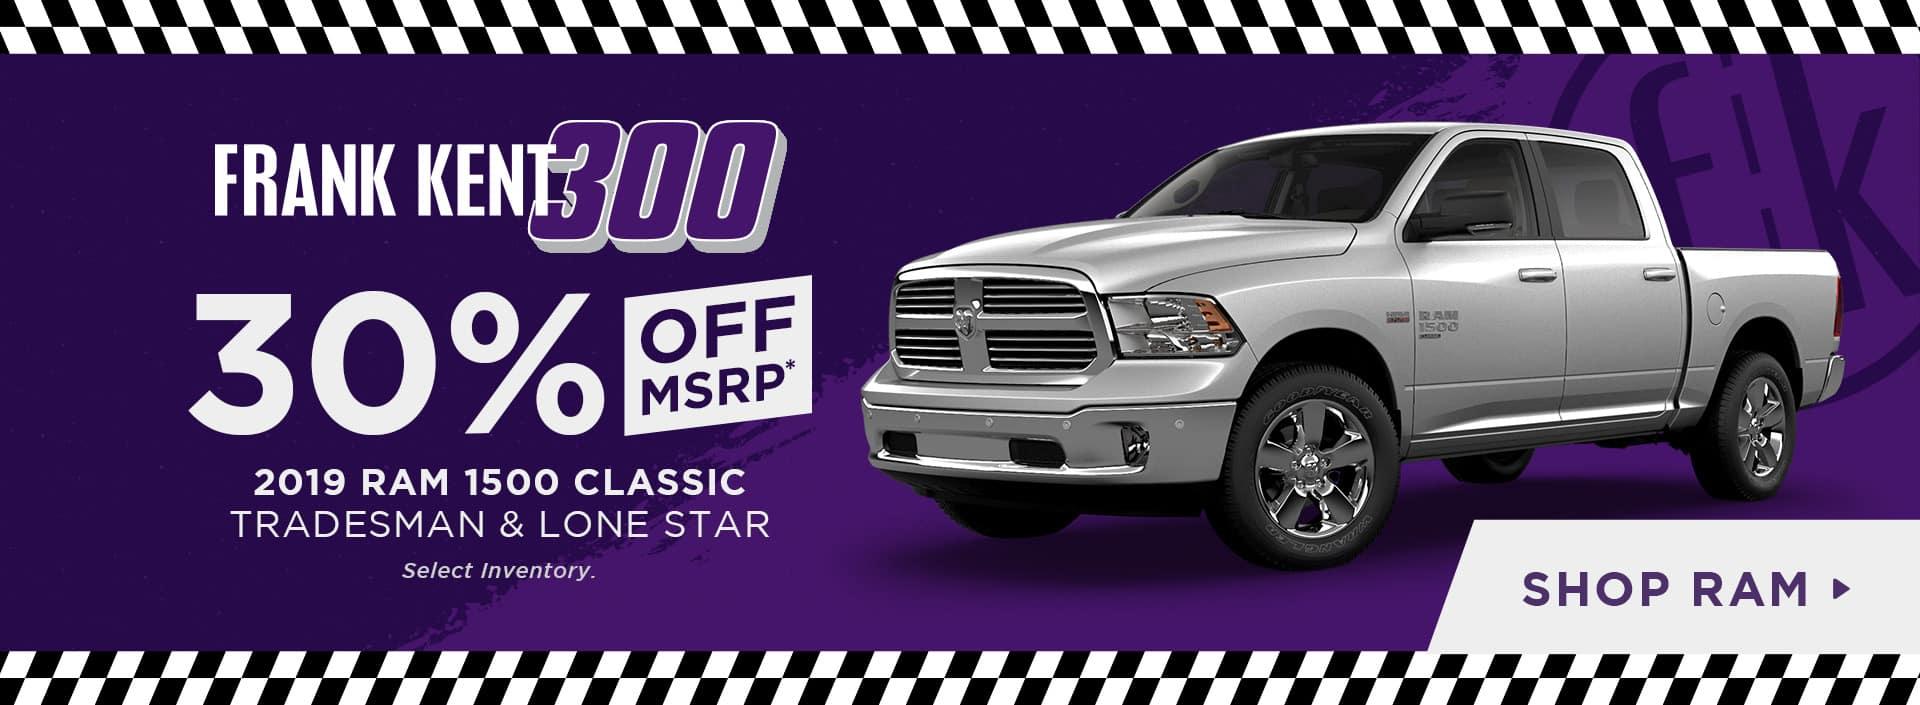 30% Off 2019 RAM 1500 Classic Tradesman & Lonestar